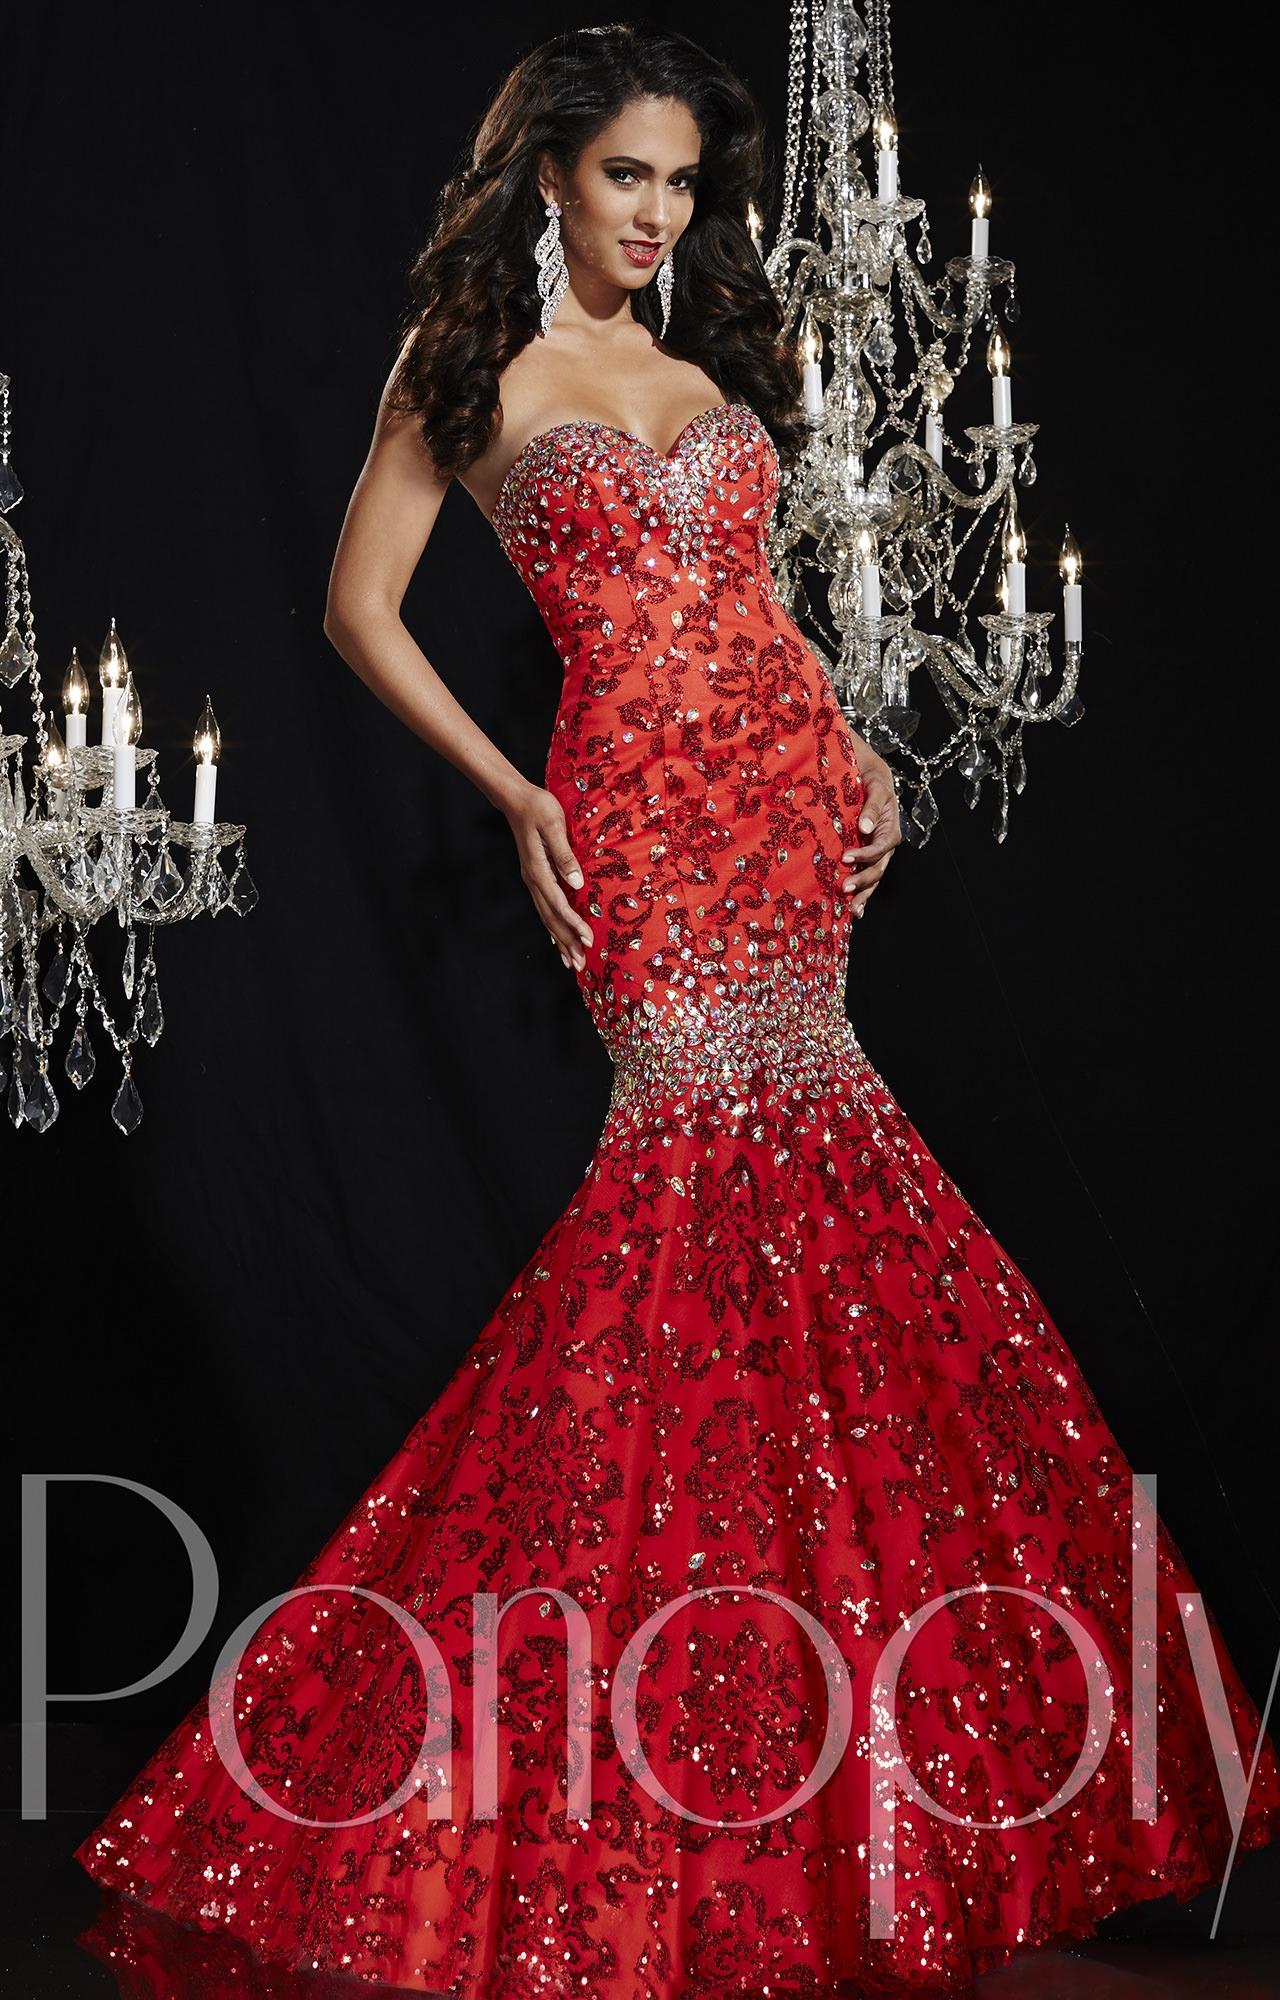 Panoply 14783 Mermaid Bliss Dress Prom Dress